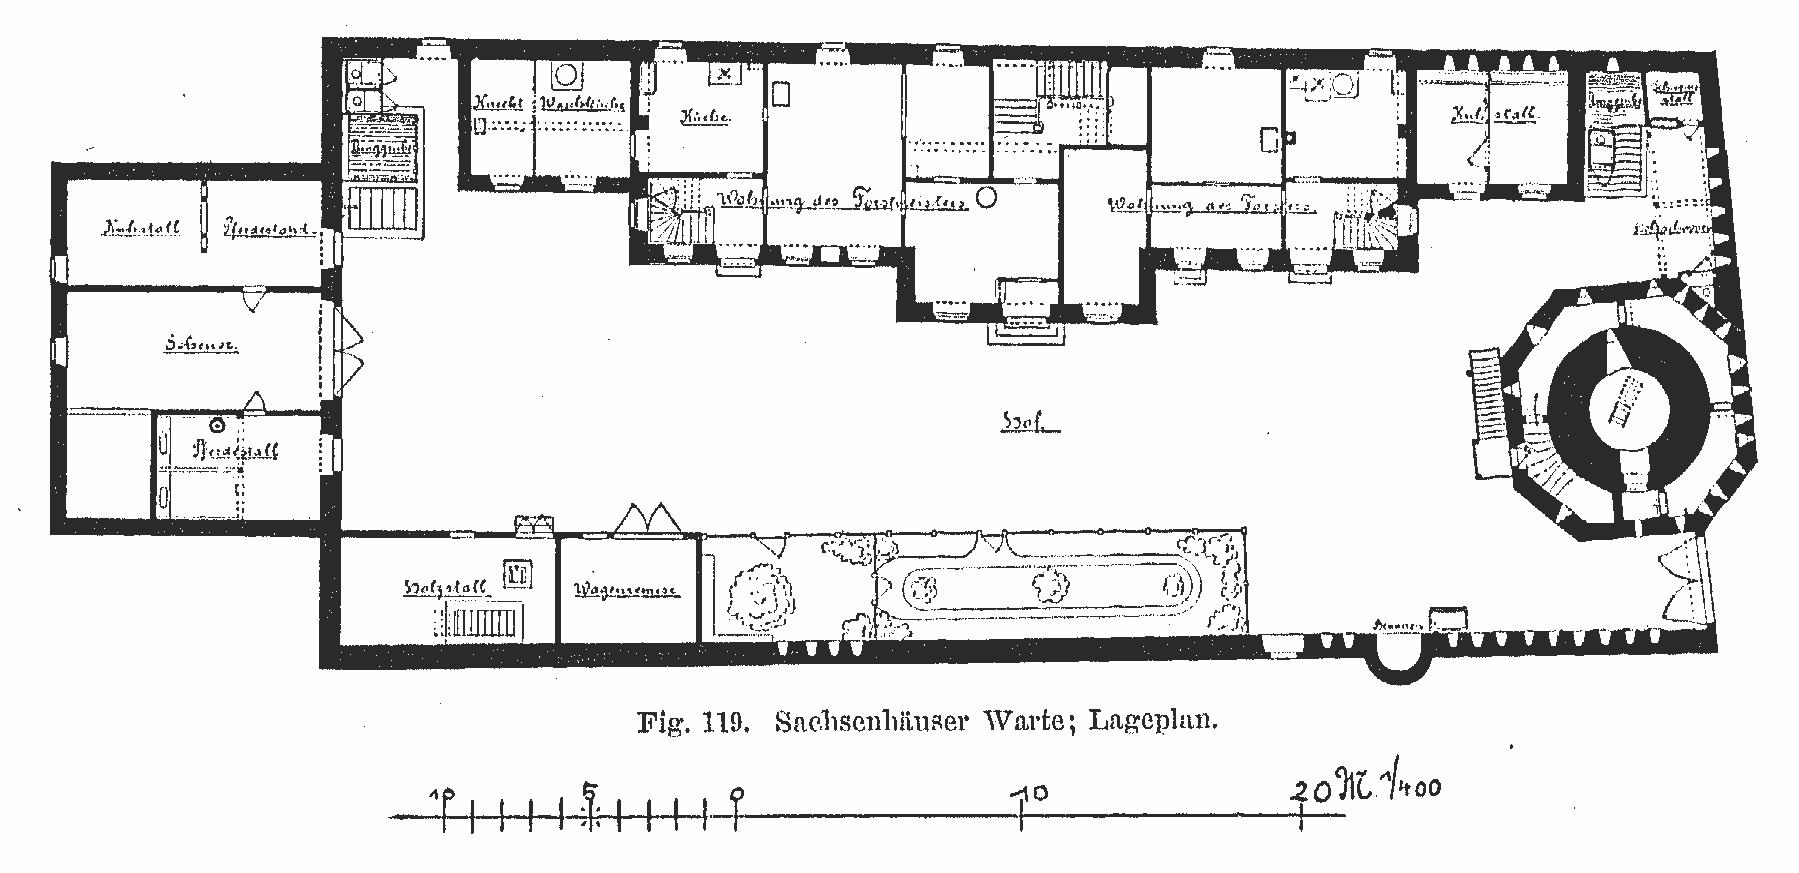 Sachsenhäuser Warte - Grundriss